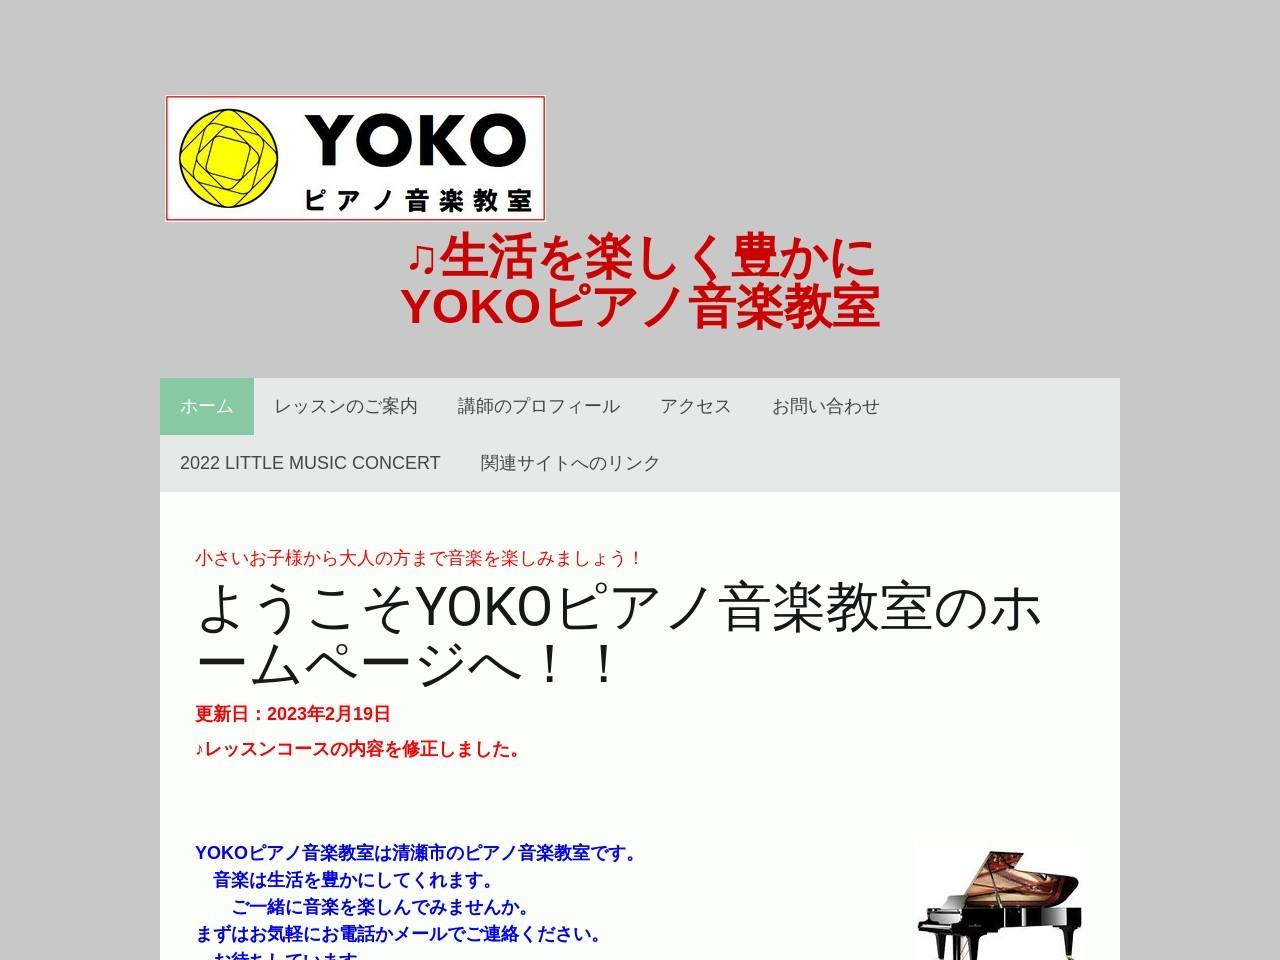 YOKOピアノ音楽教室のサムネイル